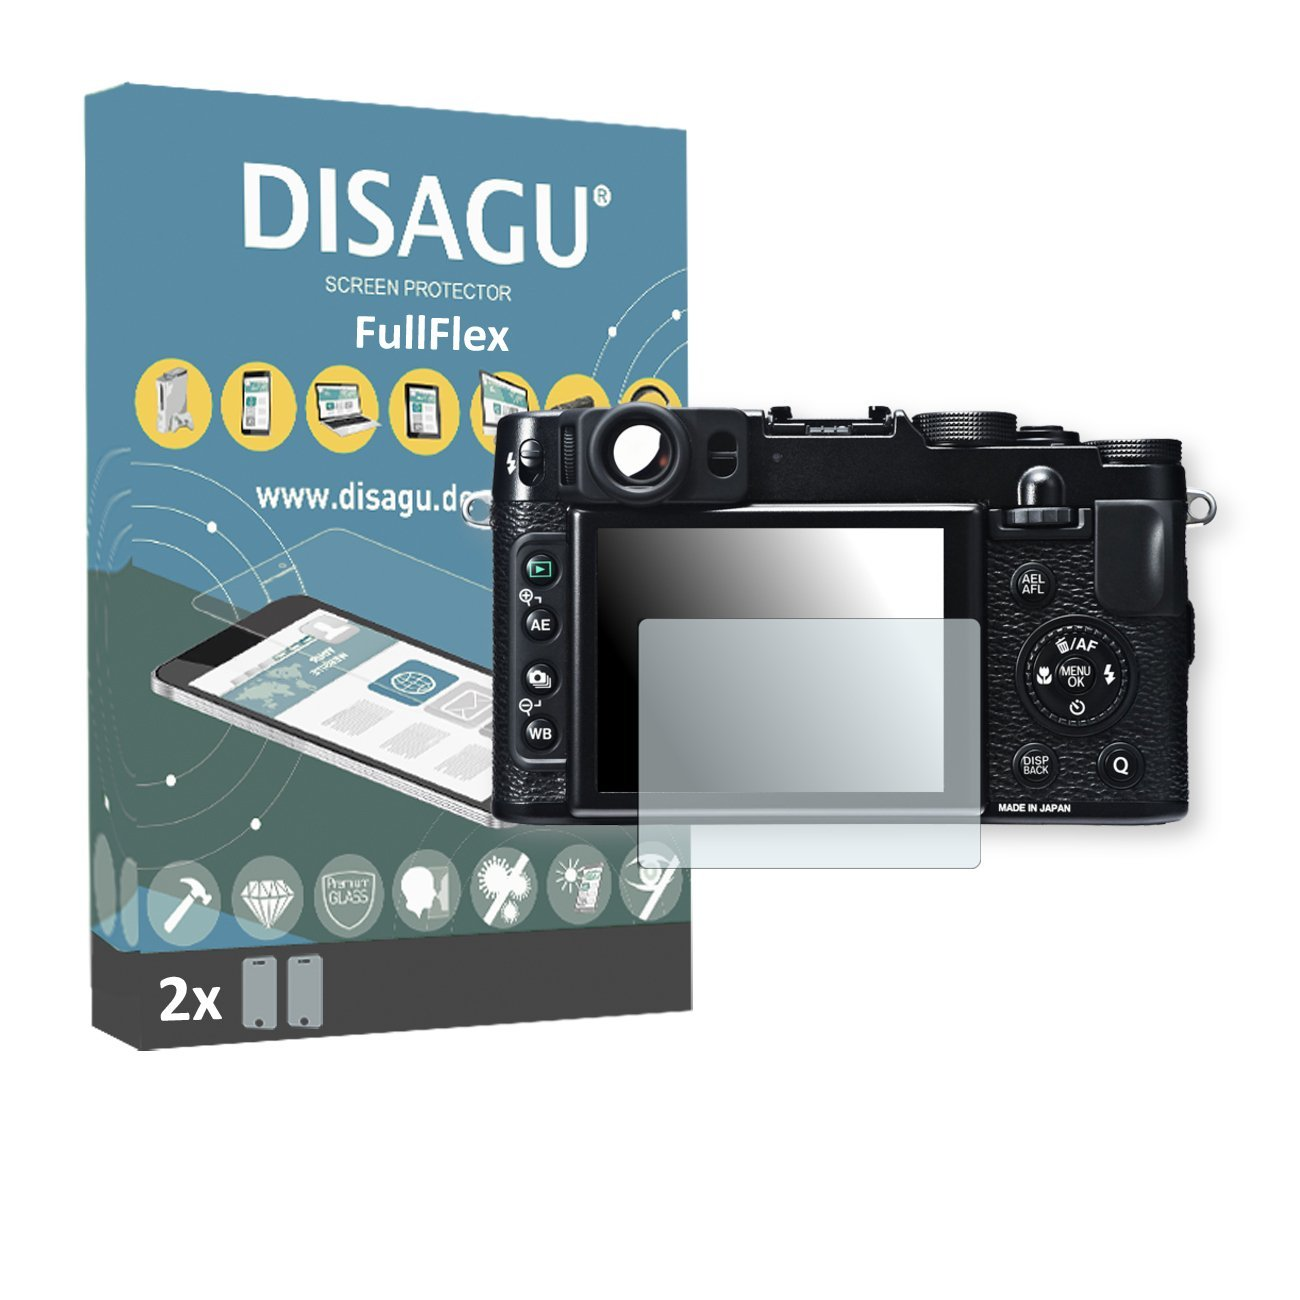 2 x Disagu FullFlex screen protector for Fujifilm X20 foil screen protector